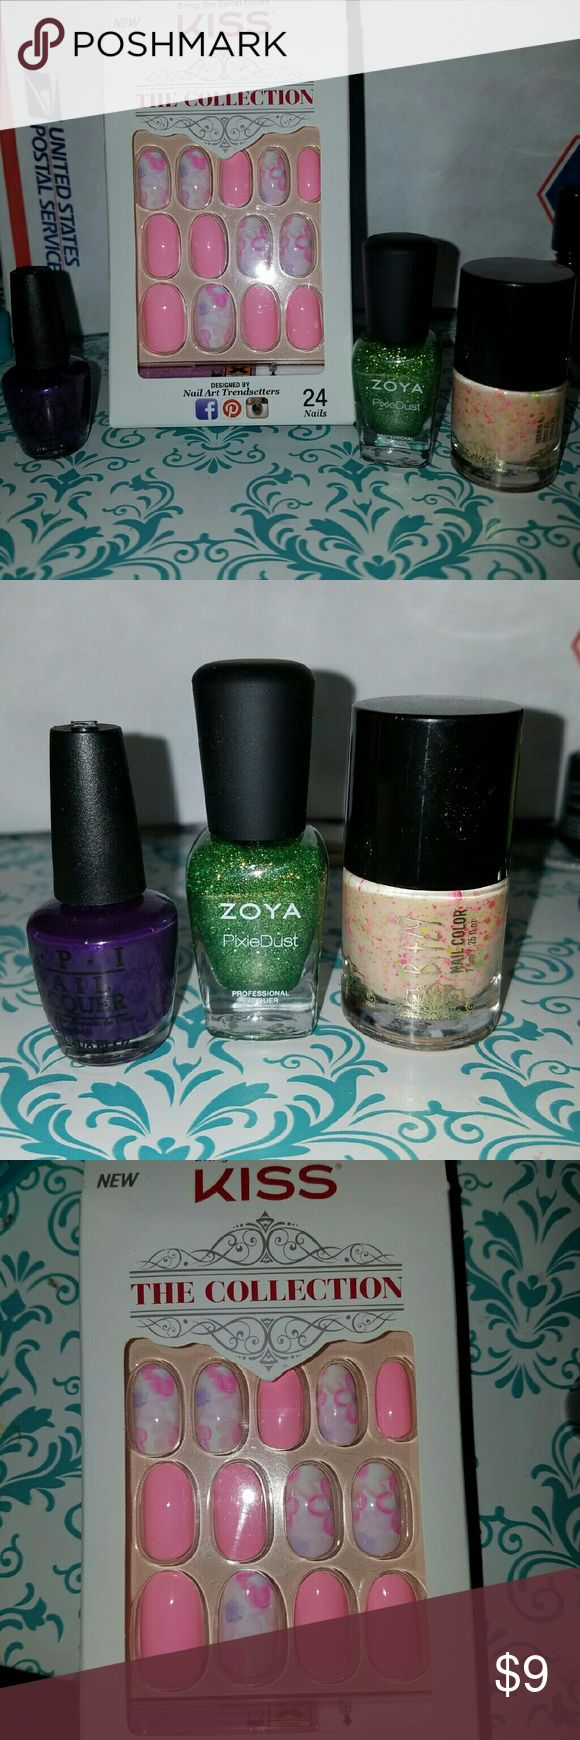 73 best My Posh Closet images on Pinterest | Beauty make up, Make up ...